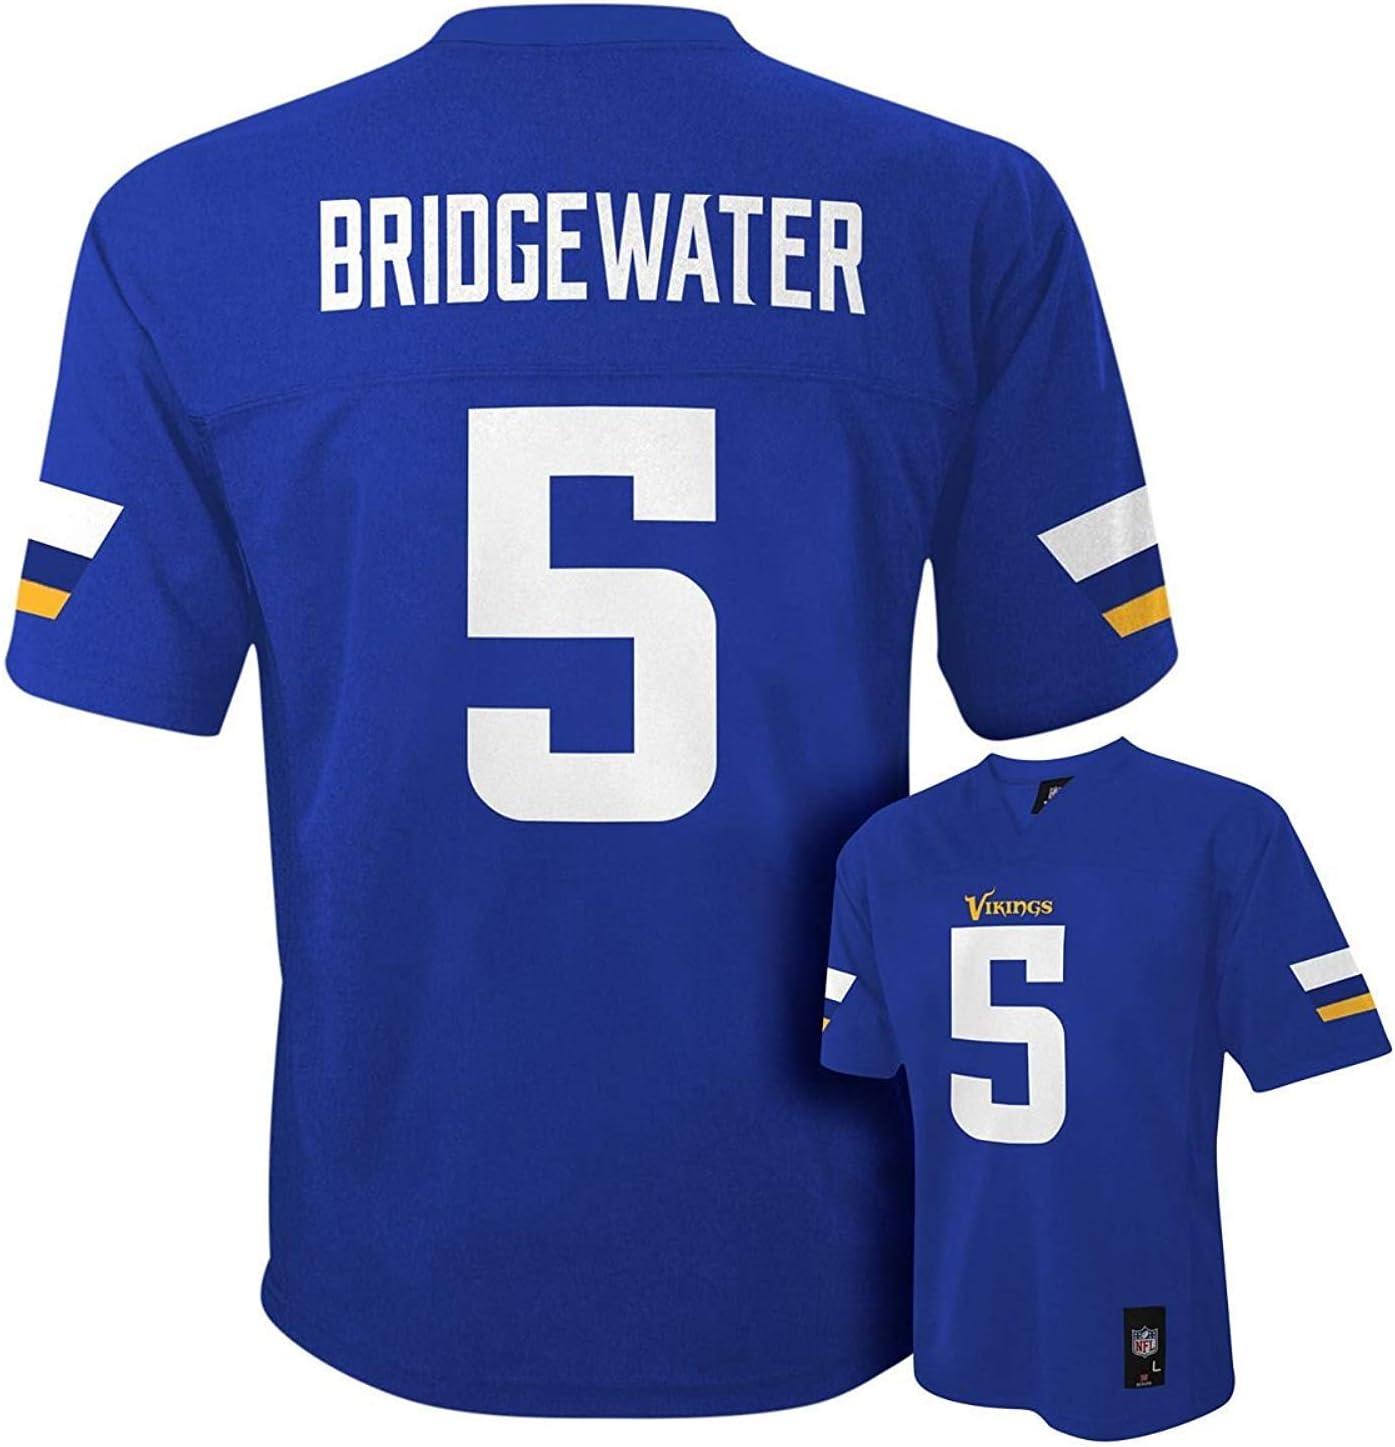 teddy bridgewater jersey, OFF 79%,Buy!